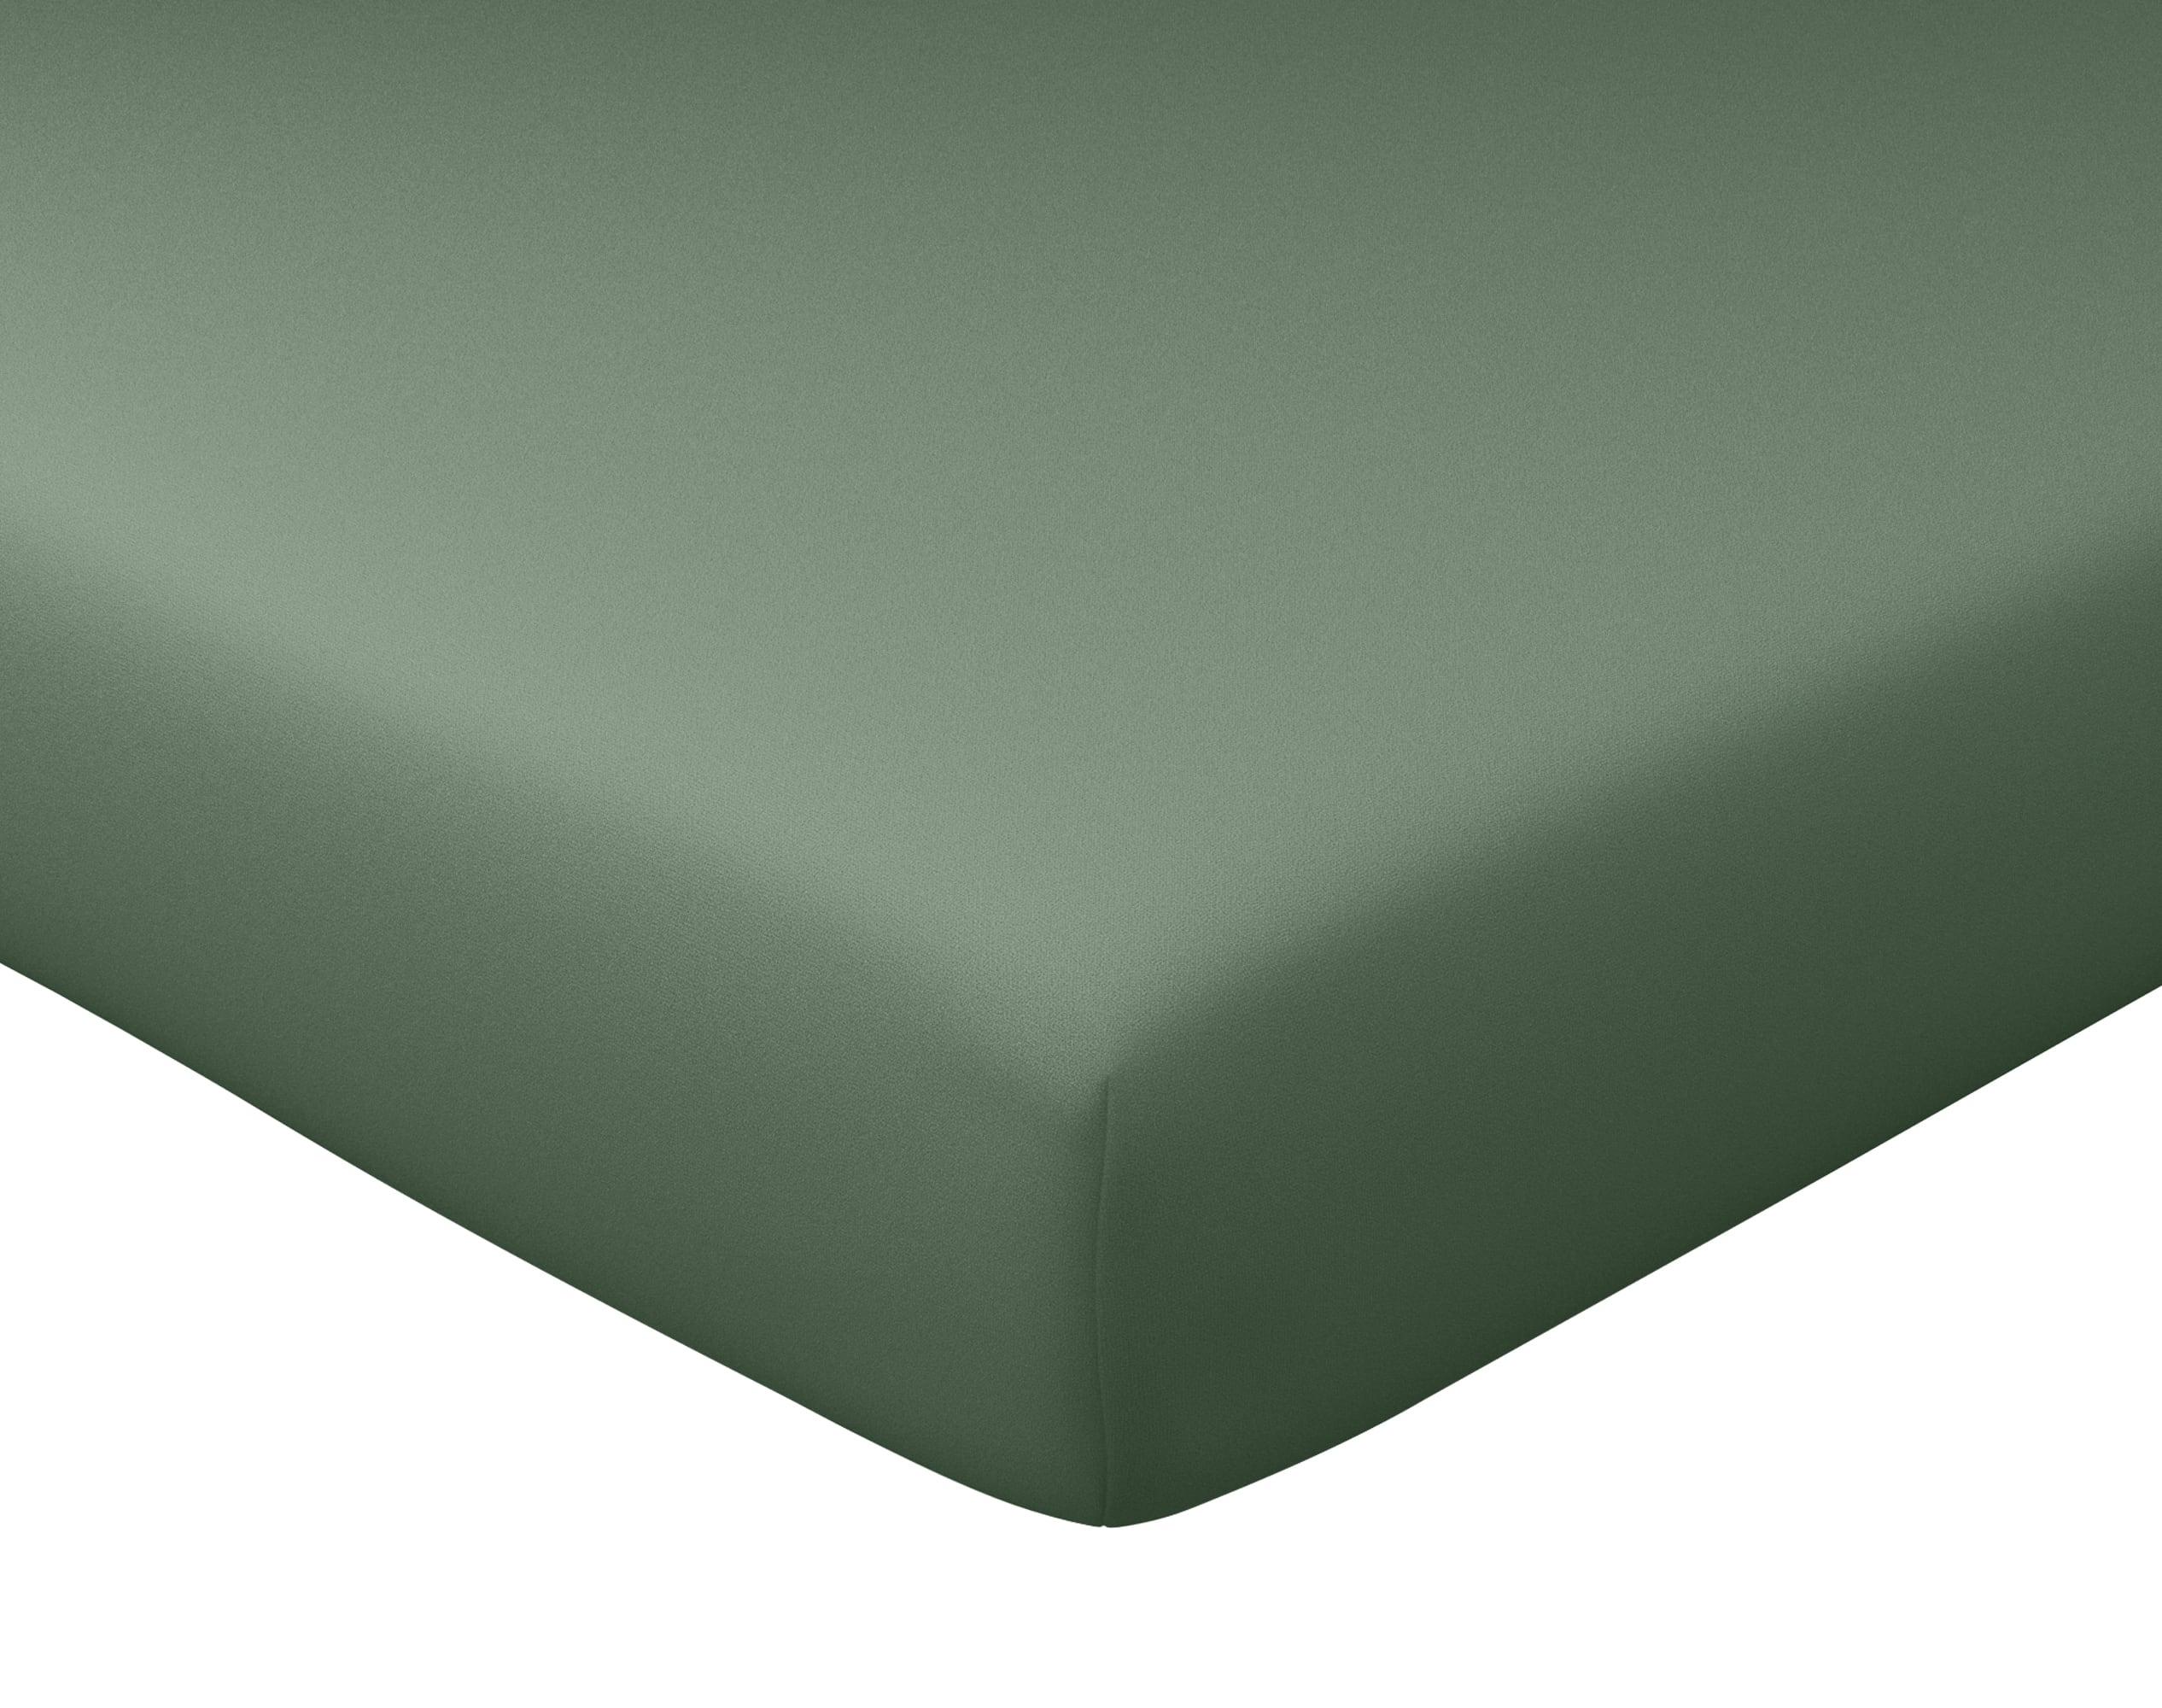 Drap-housse 90x190 en percale de coton vert kaki